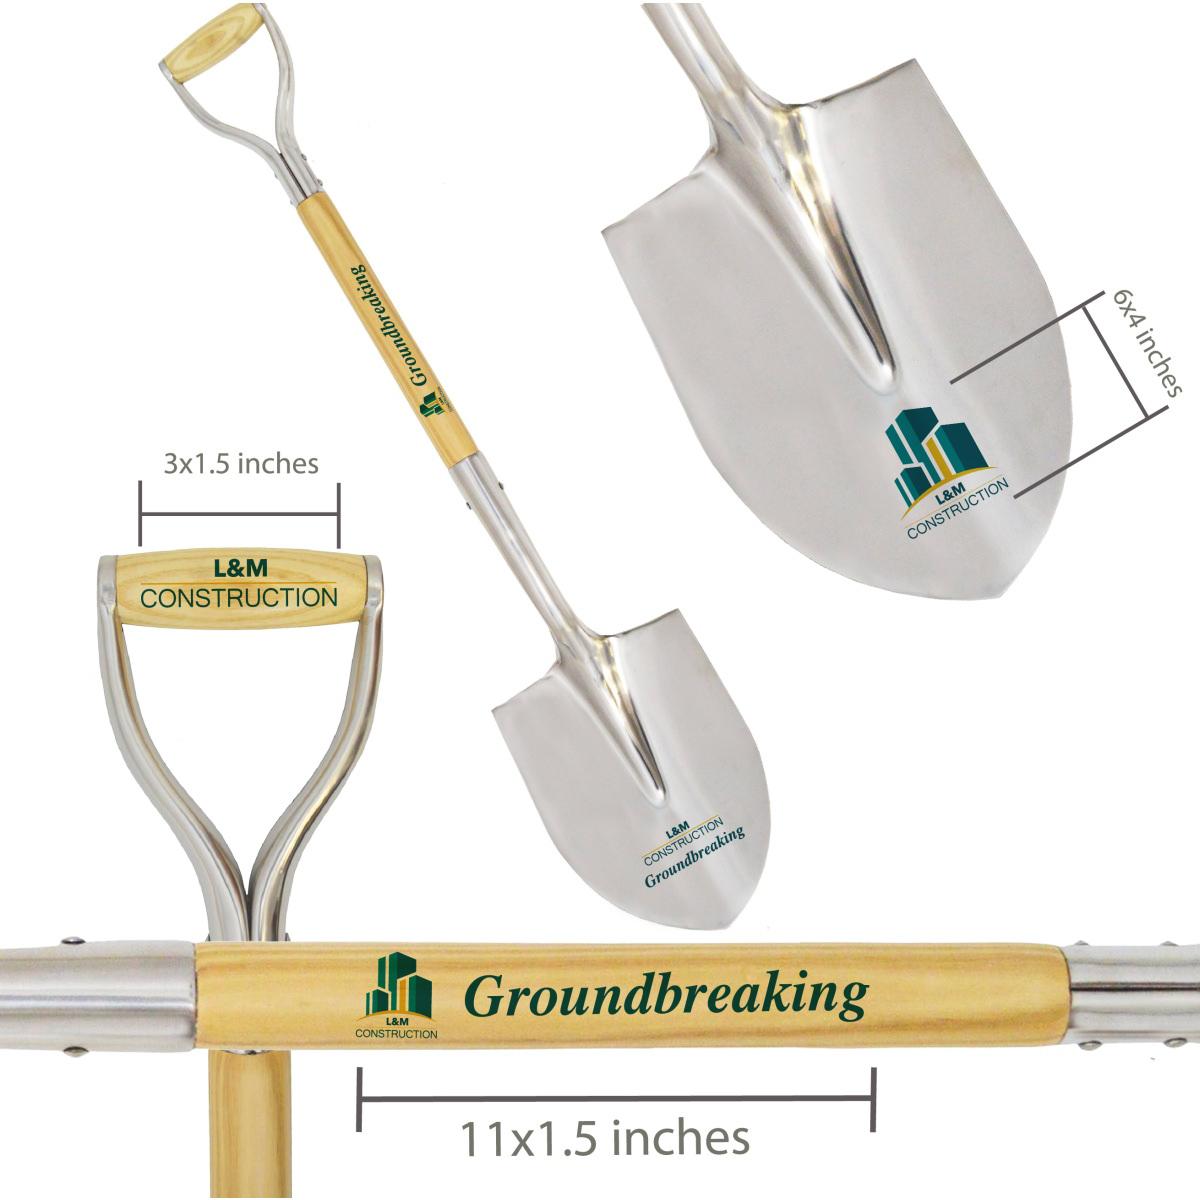 Deluxe-groundbreaking-shovel-customization